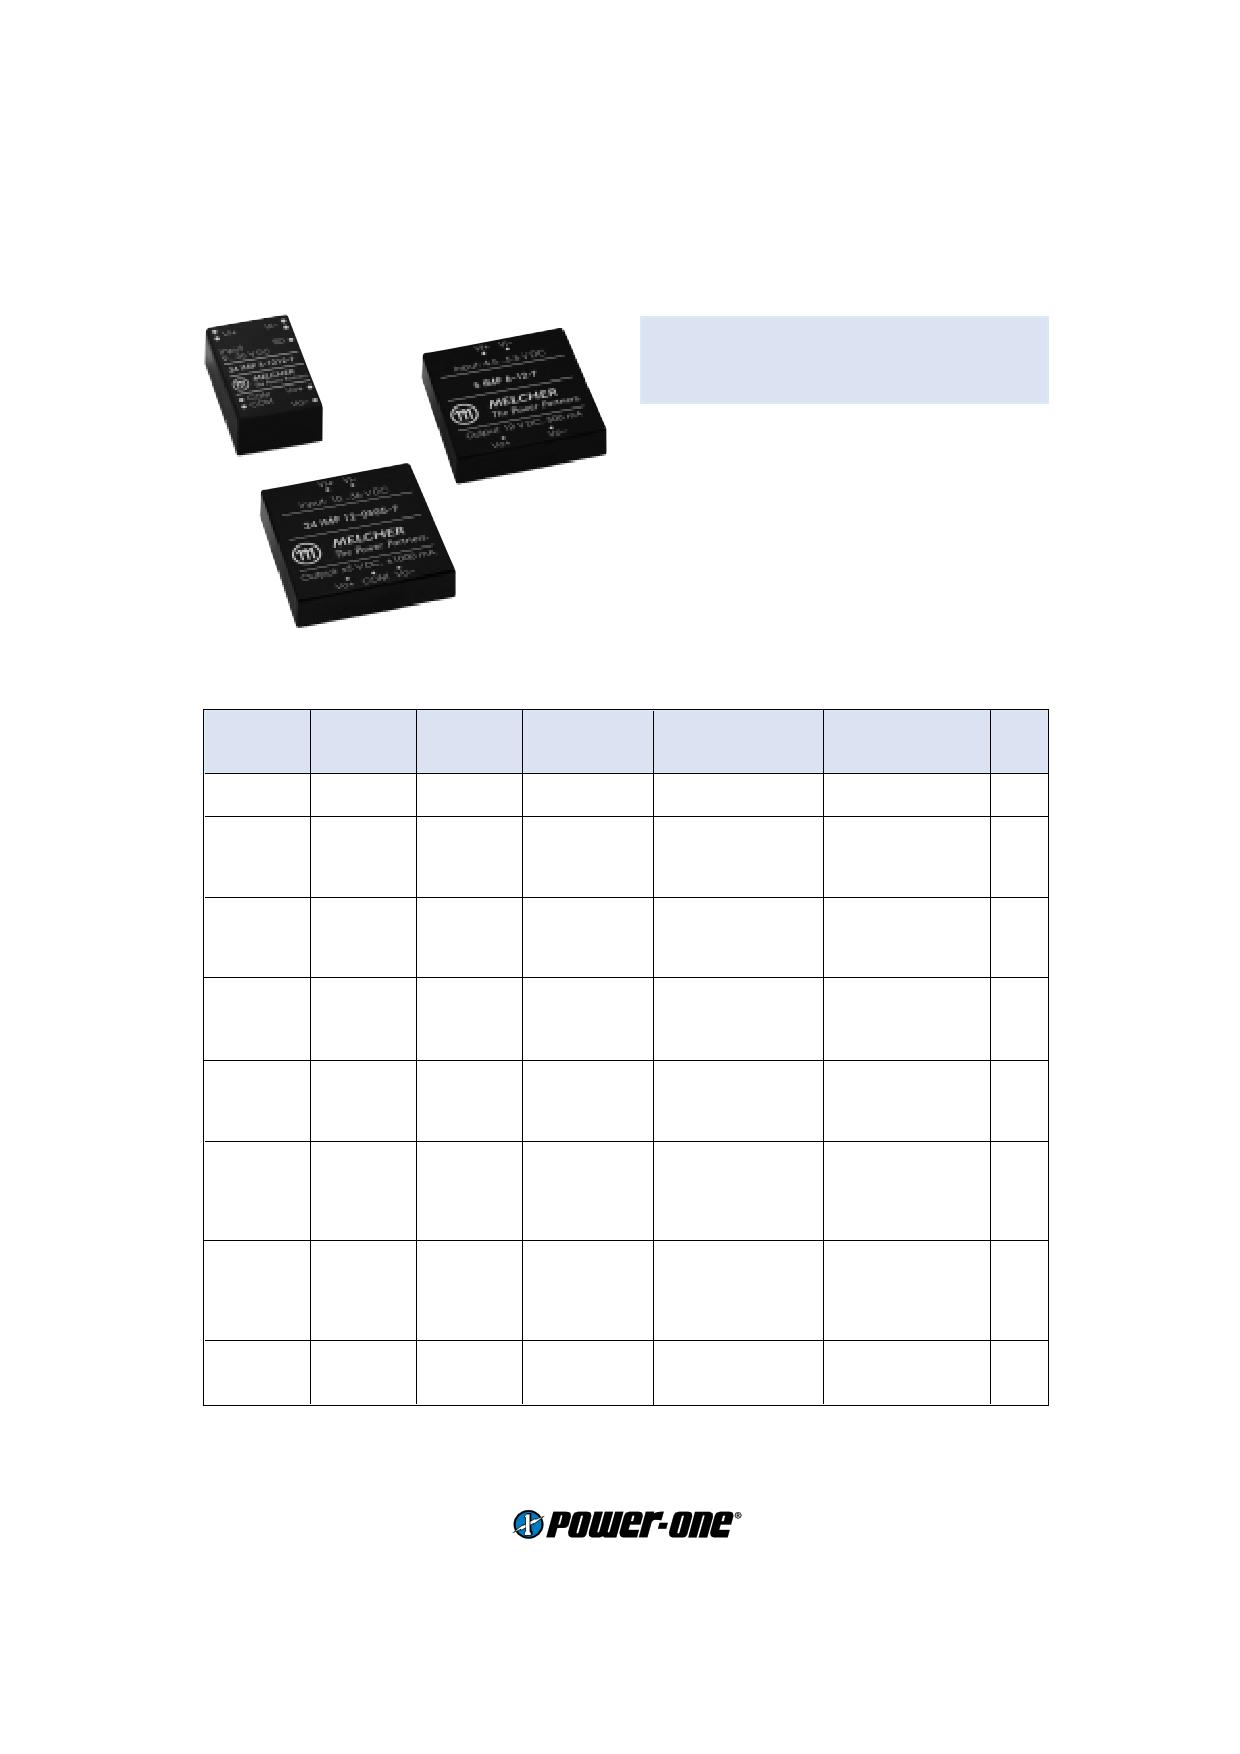 24IMP12-15-7 datasheet